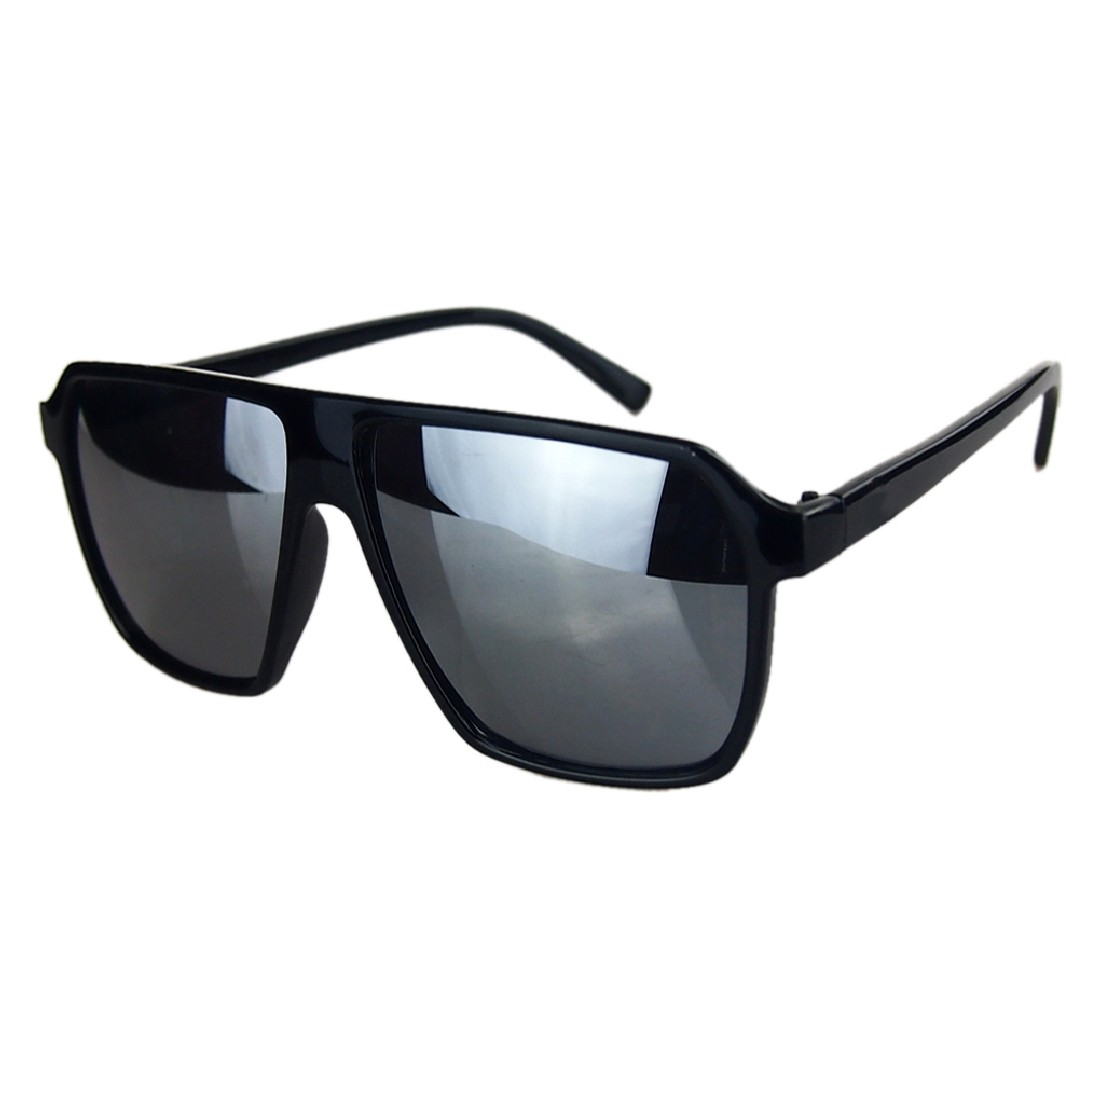 Large Frame Mens Glasses : Compare Prices on Thick Framed Eyeglasses- Online Shopping ...